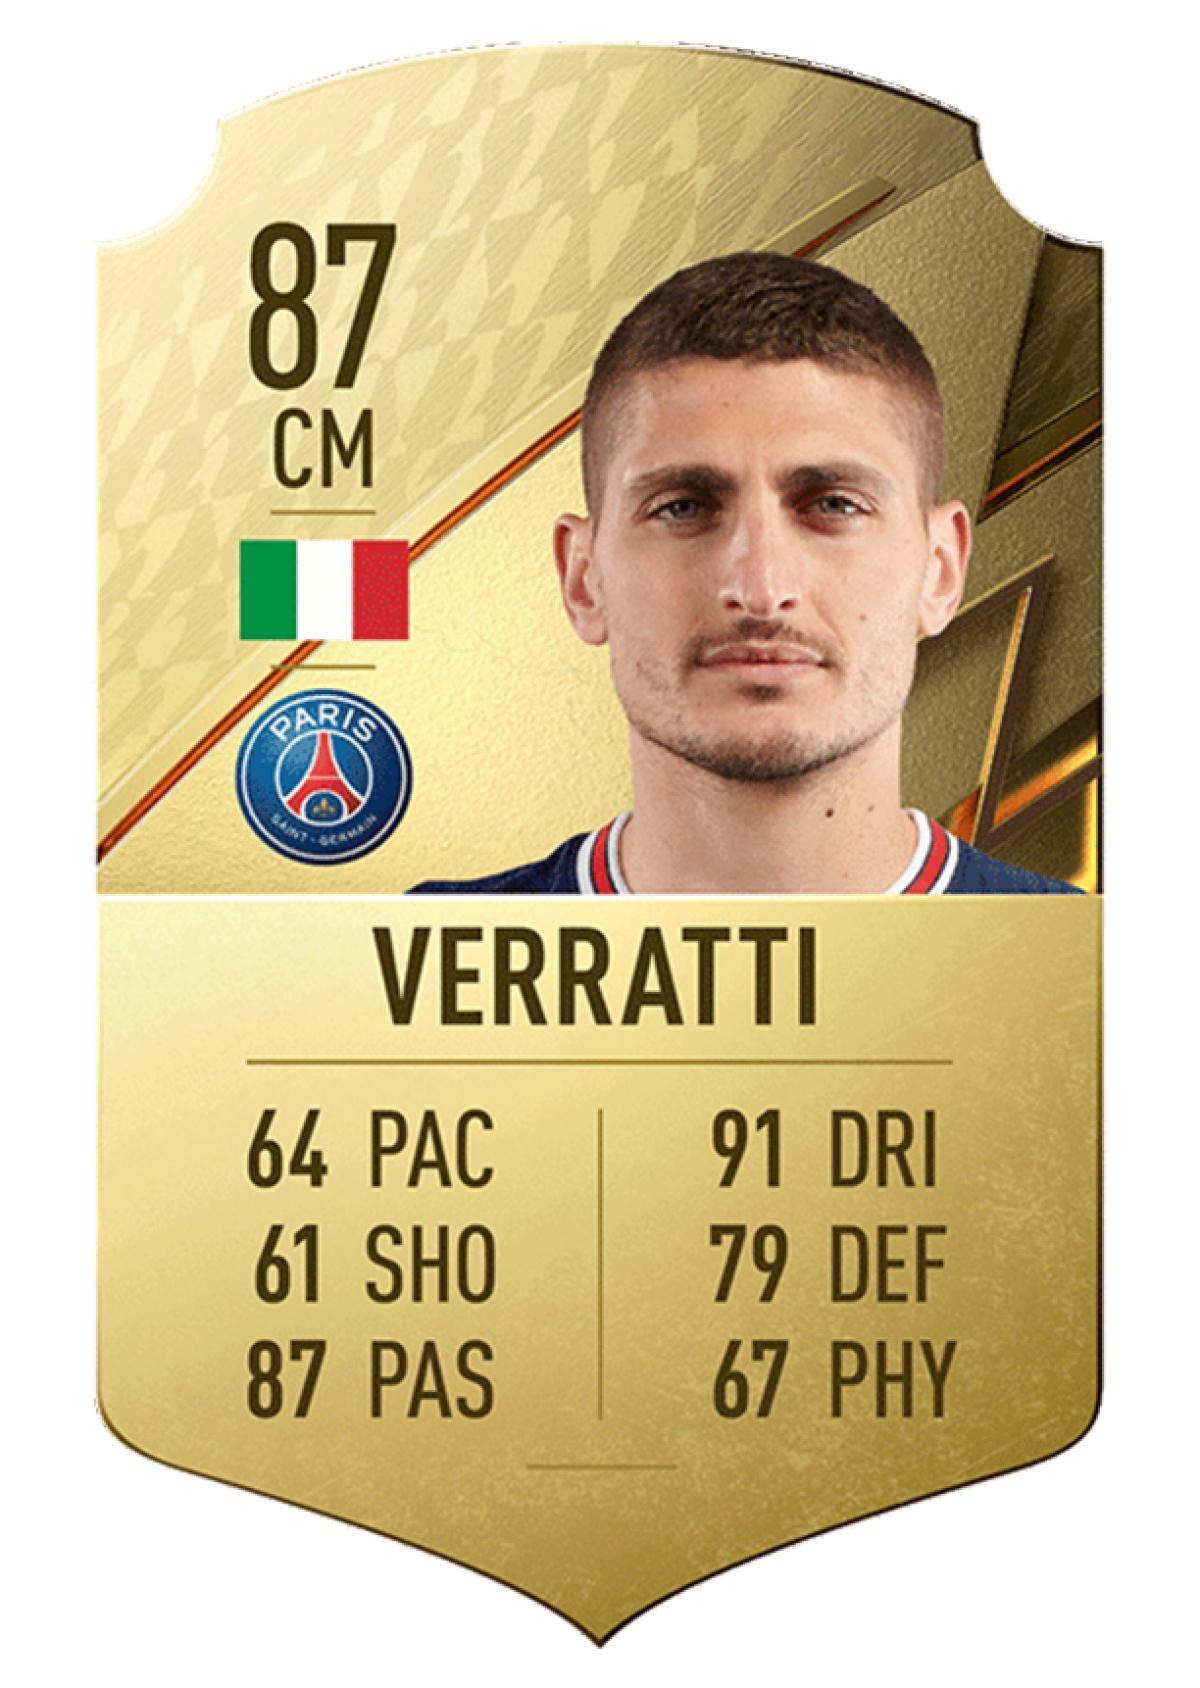 6. Marco Verratti | Paris Saint-Germain | Chỉ số rê bóng 91